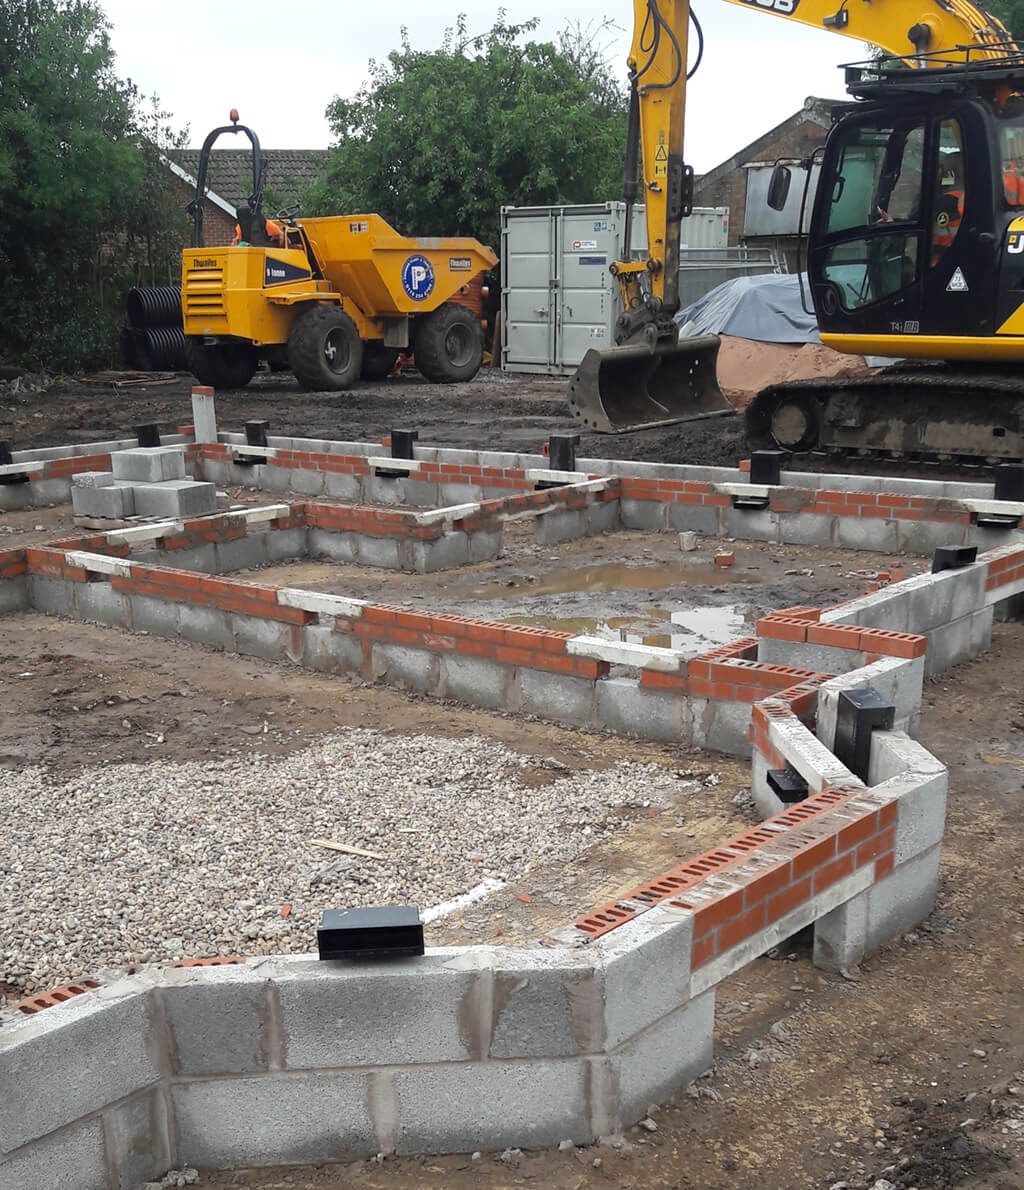 Work starts at Sharnford